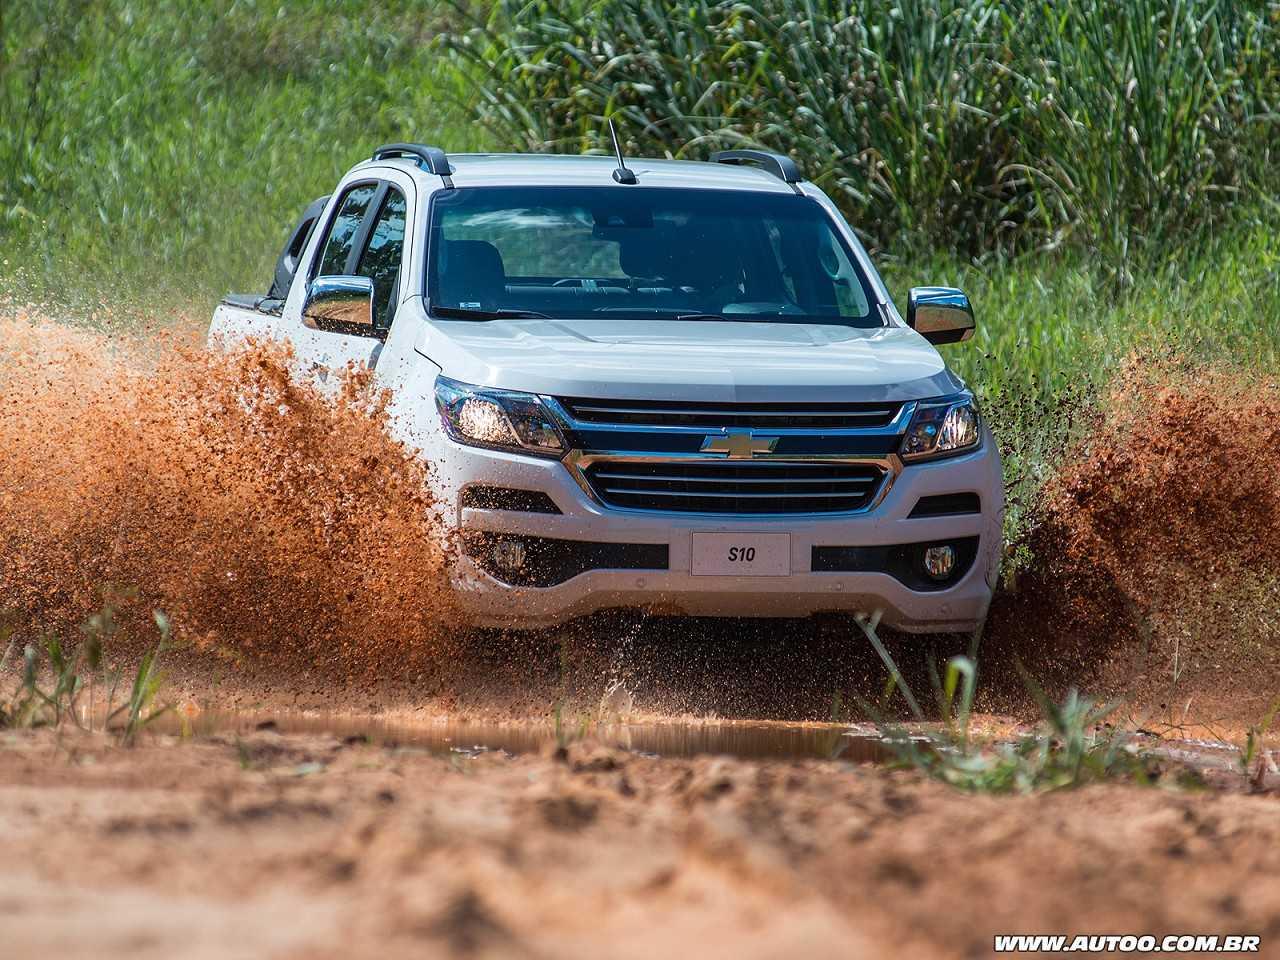 ChevroletS10 2018 - frente